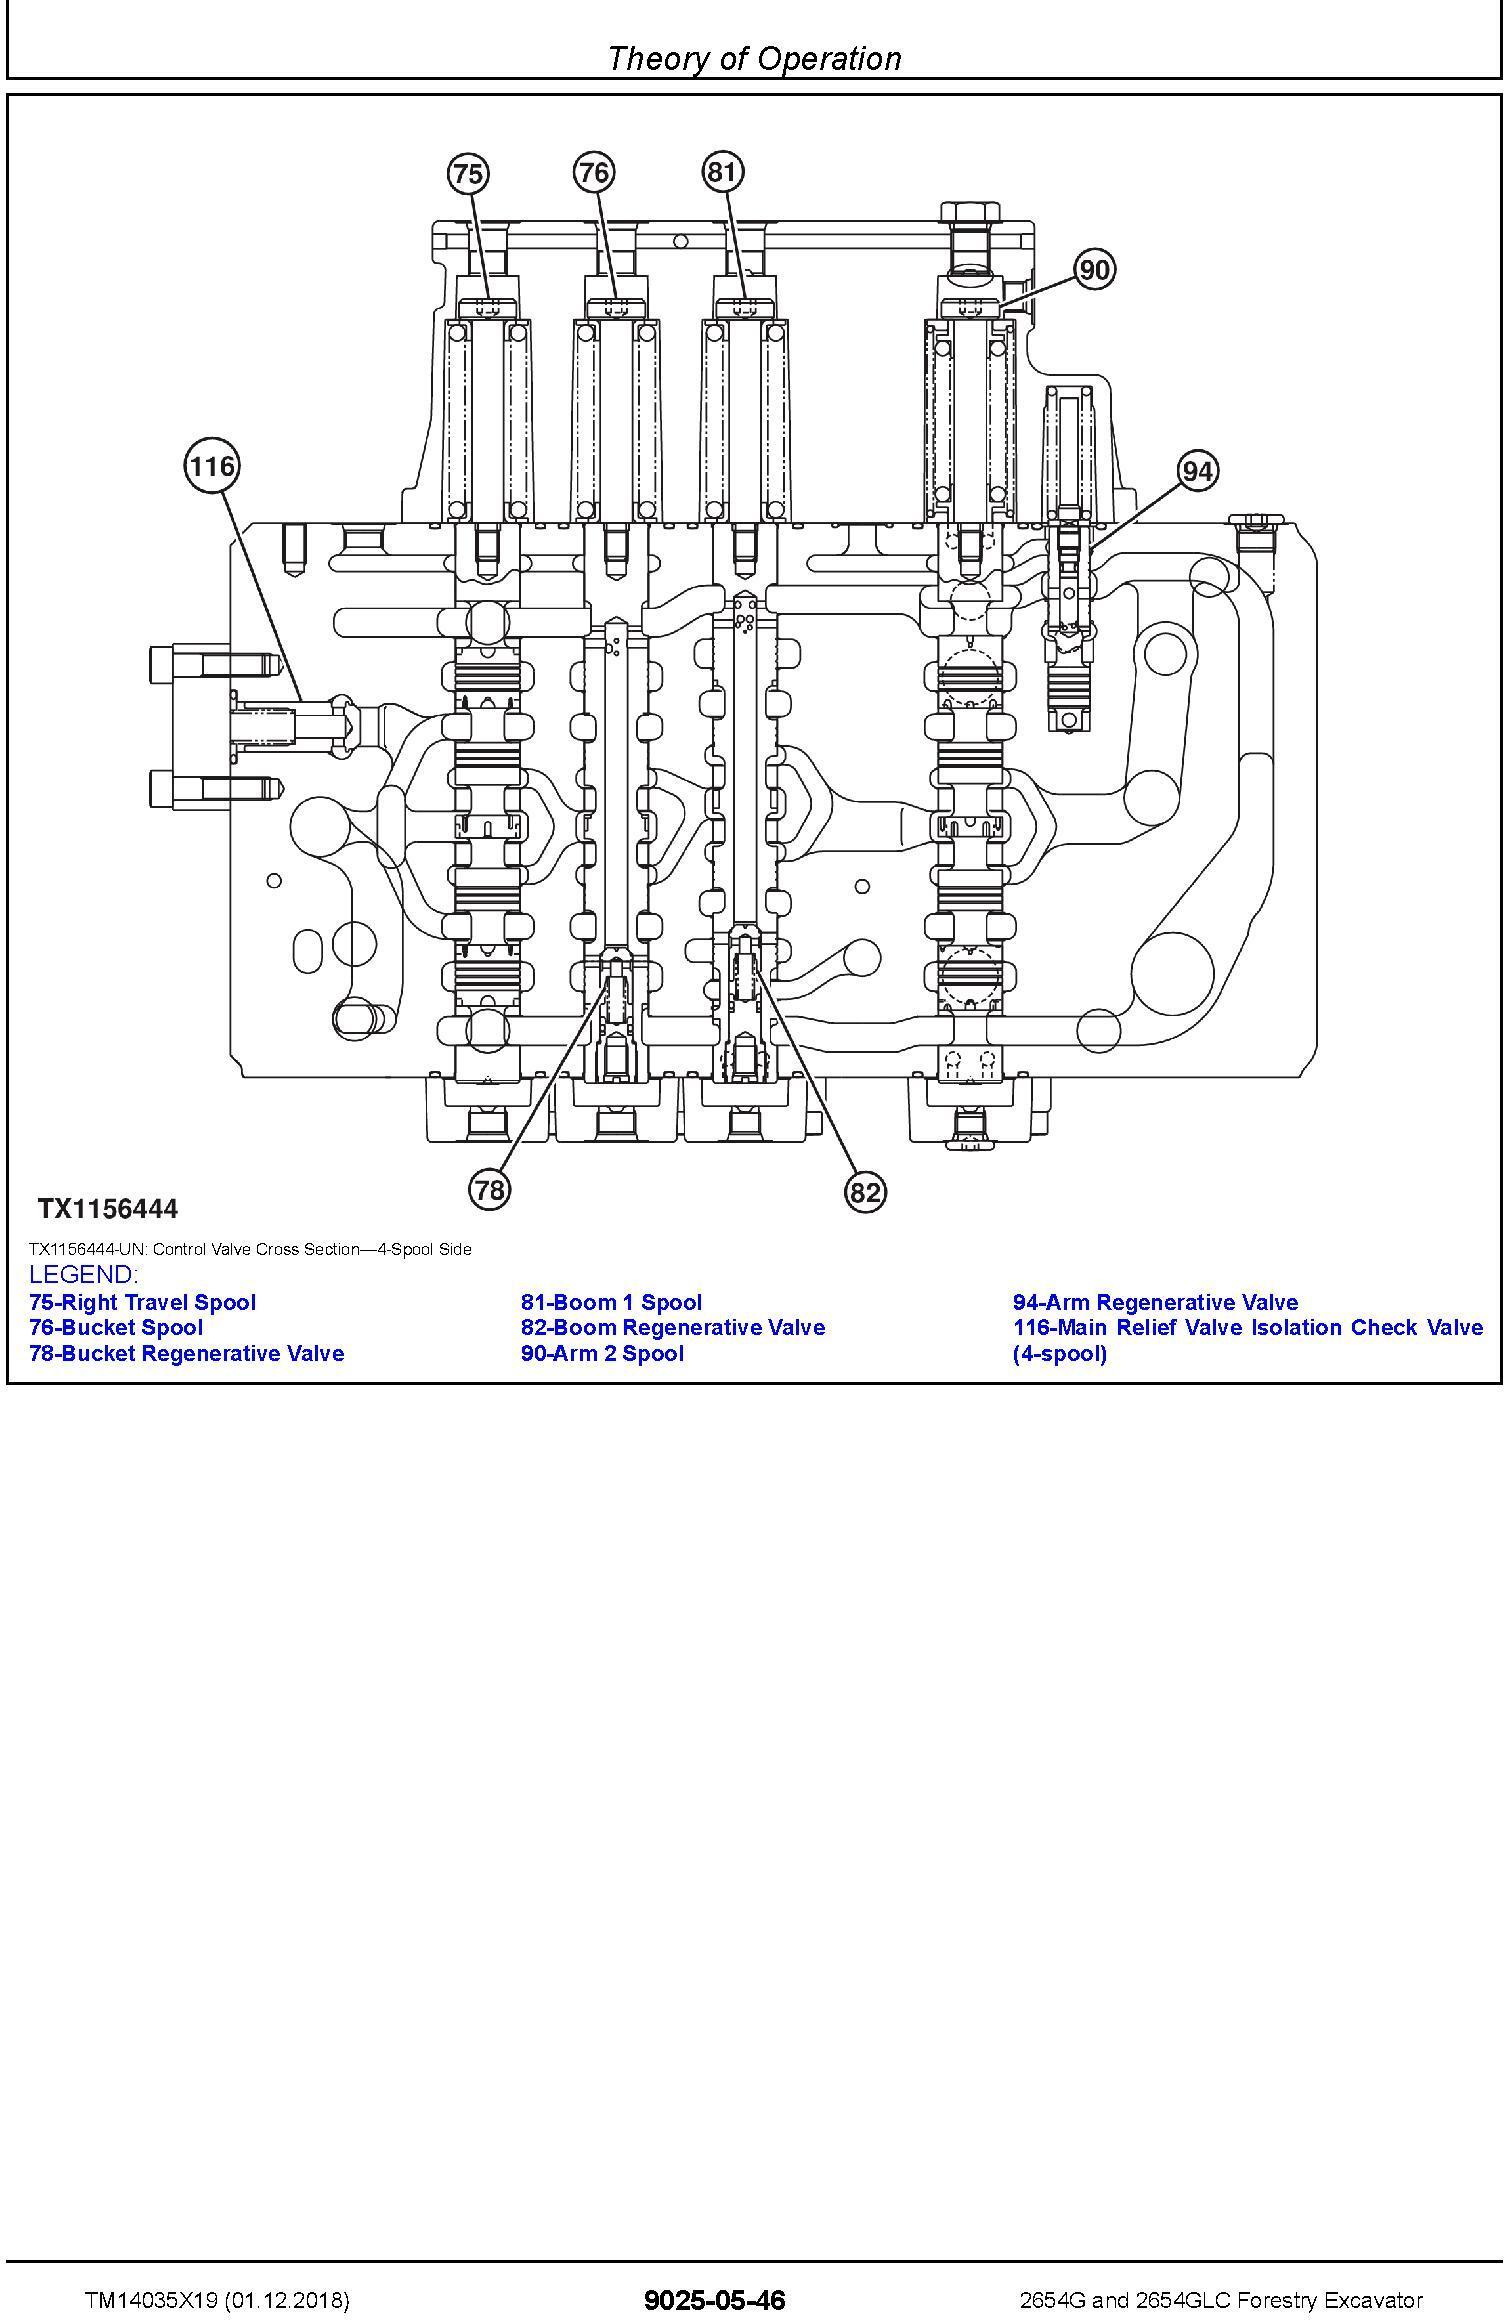 John Deere 2654G, 2654GLC (SN. C260001-, D260001-) Forestry Excavator Diagnostic Manual (TM14035X19) - 3